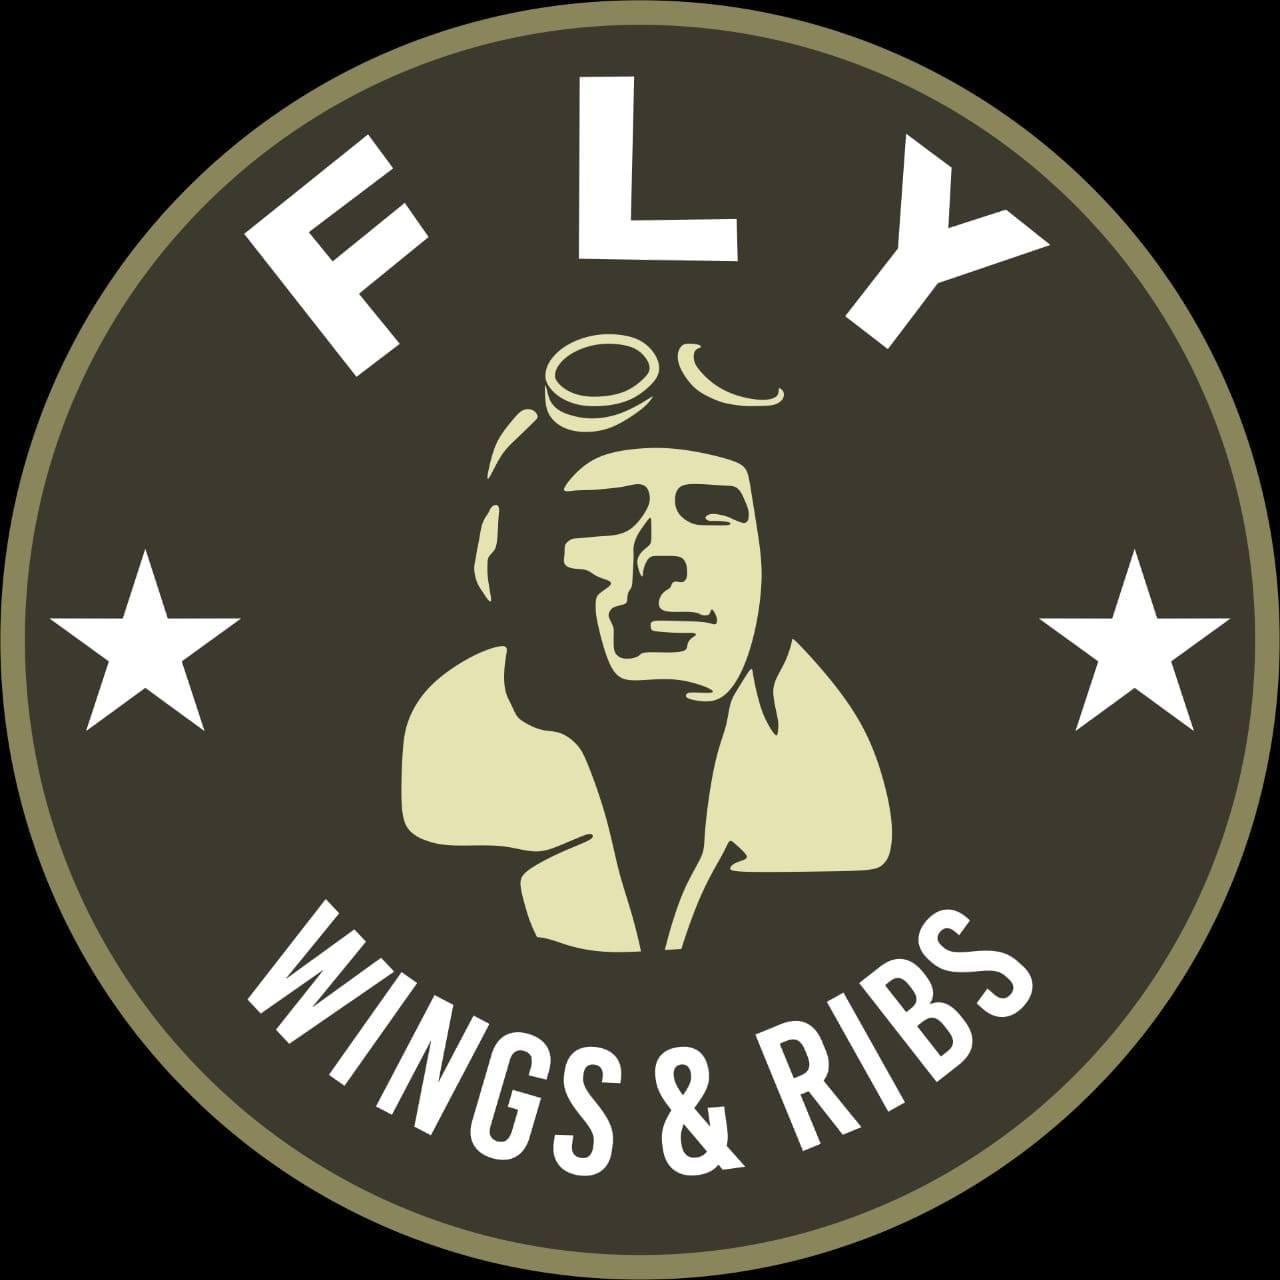 Fly Wings & Ribs